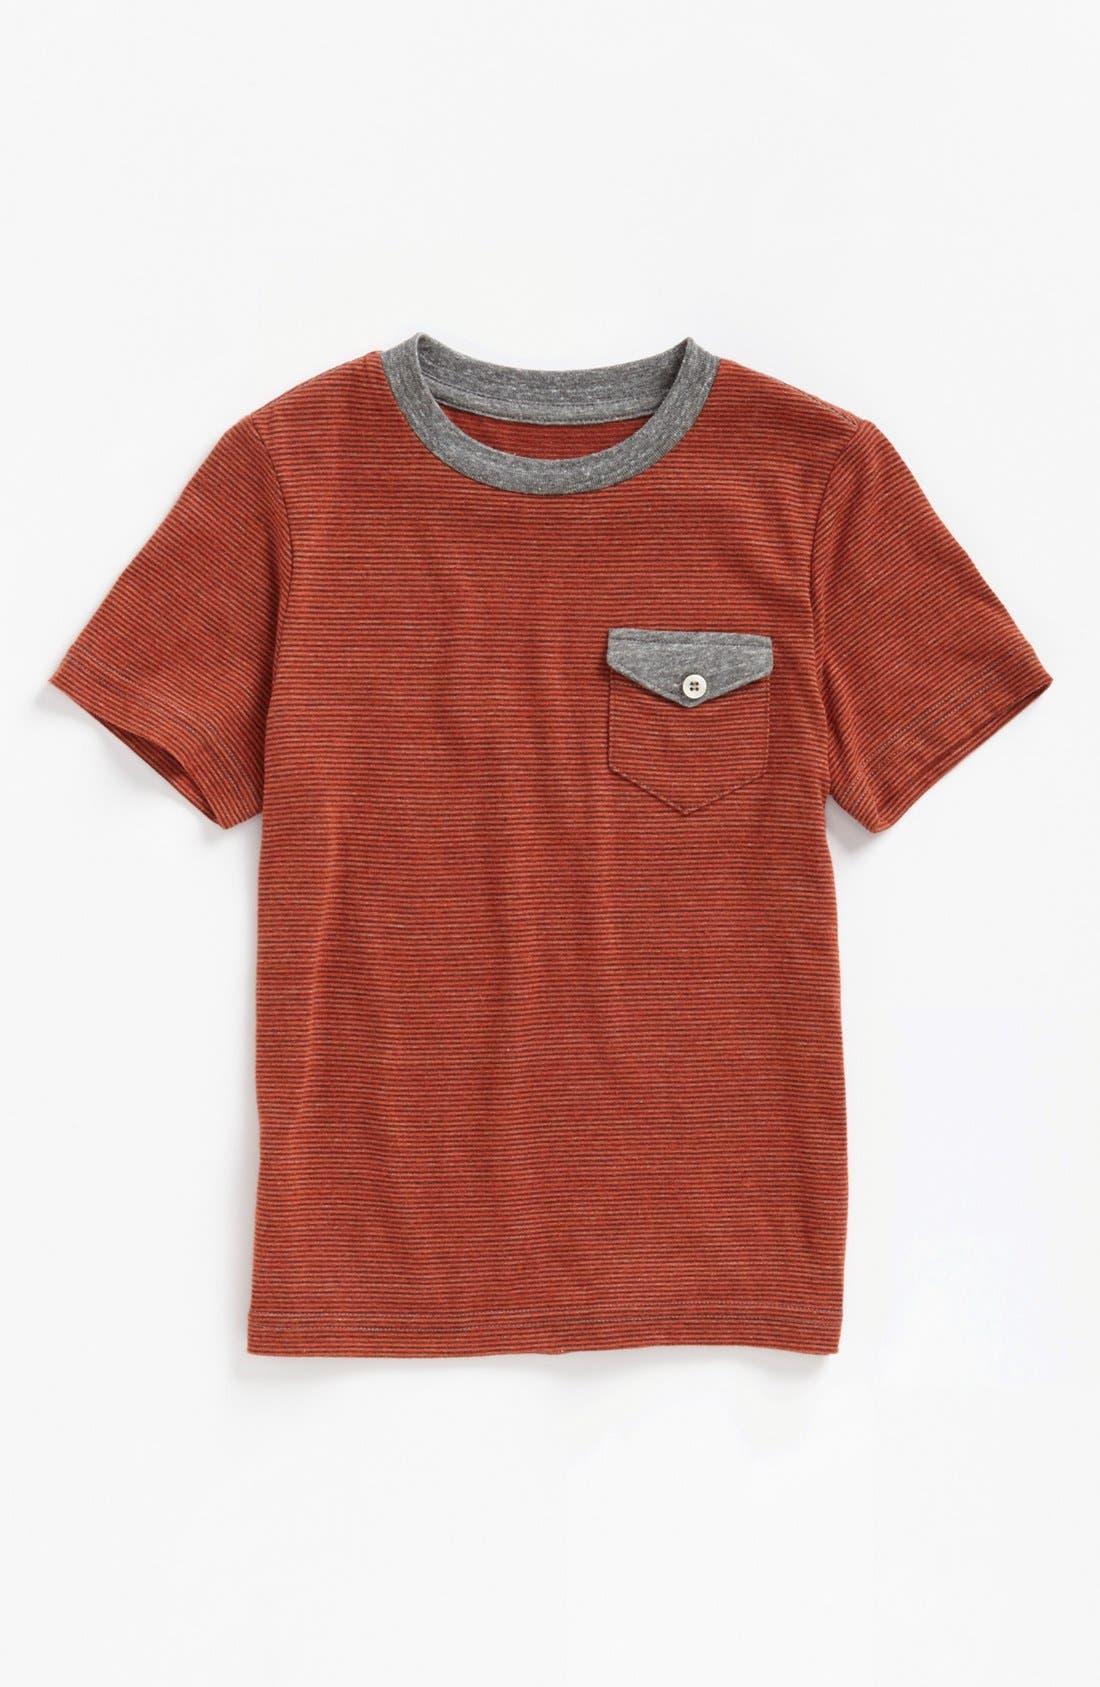 Main Image - Tucker + Tate 'Bretland' T-Shirt (Little Boys)